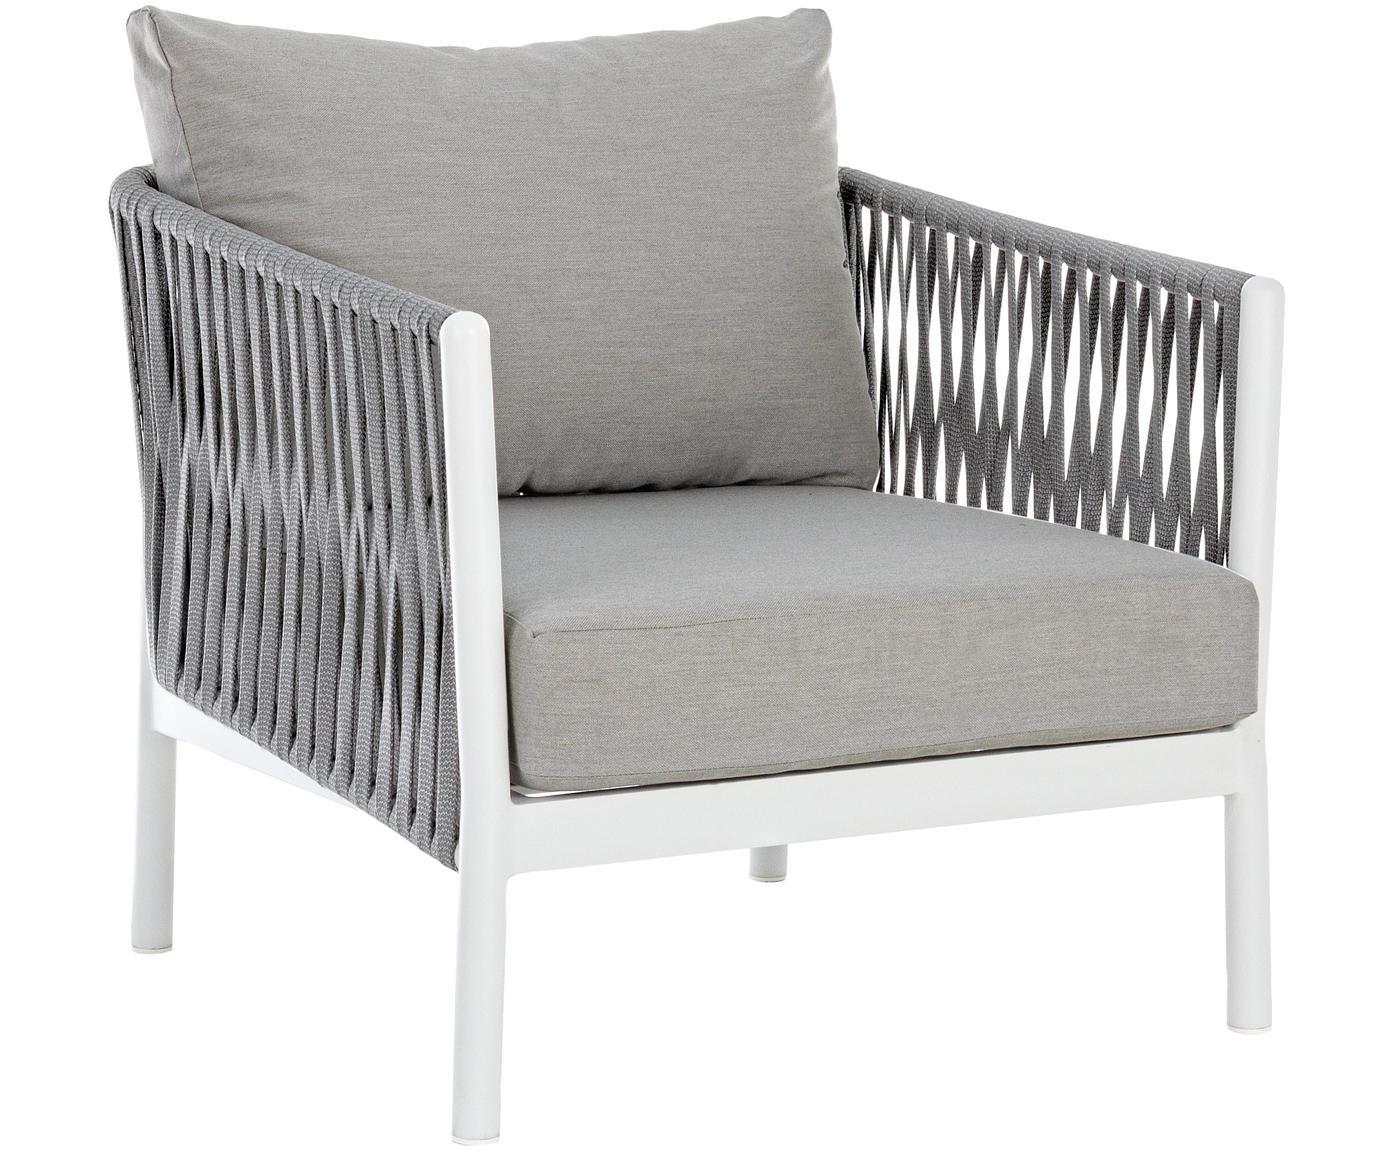 Outdoor fauteuil Florencia, Frame: gepoedercoat aluminium, Zitvlak: polyester, Grijs, wit, B 80 x D 85 cm